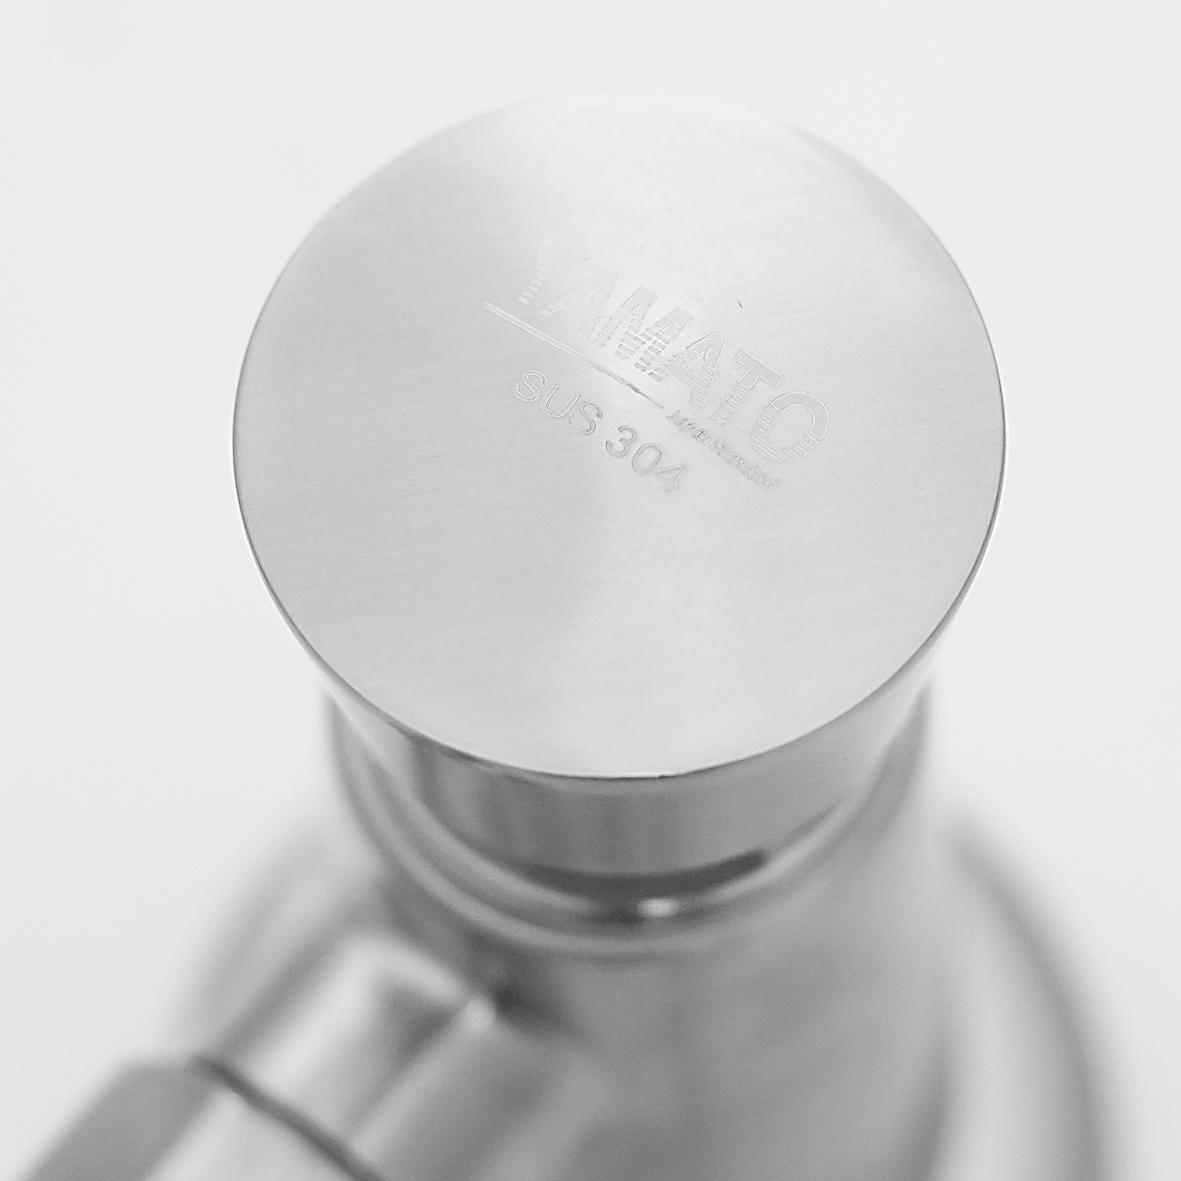 Van xả bồn tiểu nam - INOX SUS 304